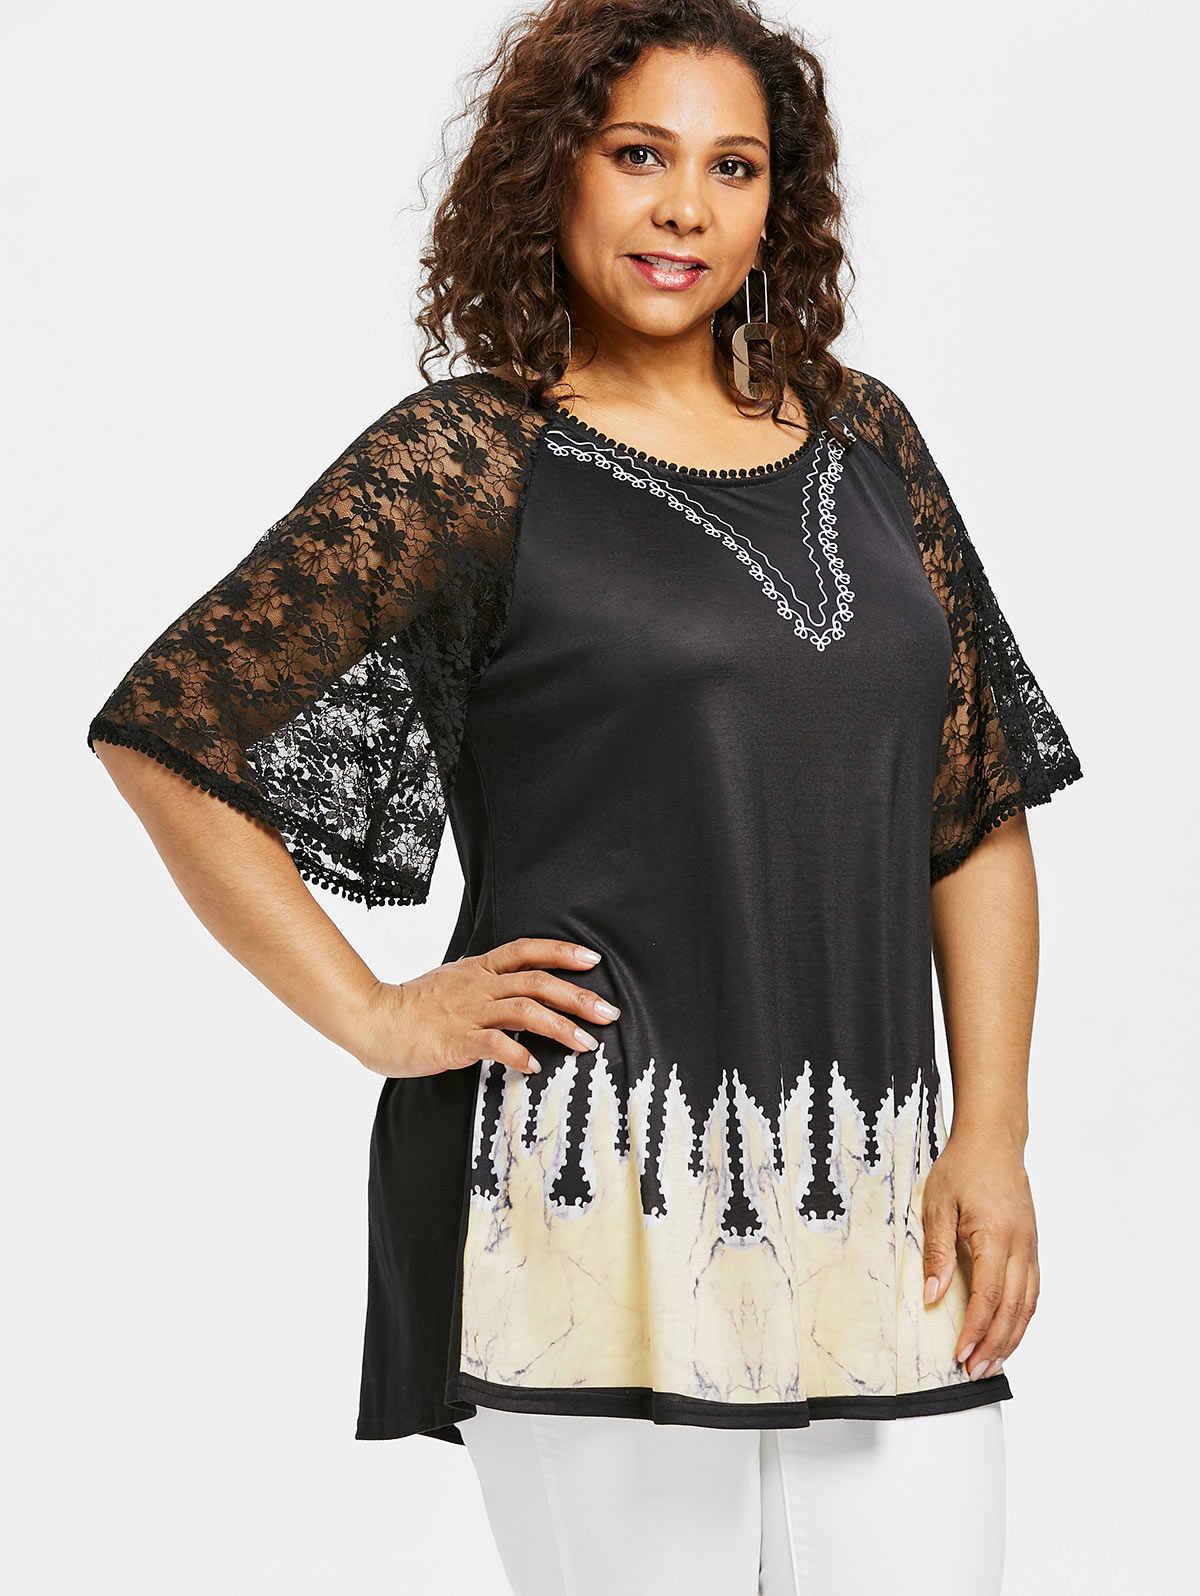 65f04ebc ... Rosegal Plus Size Ethnic Print Lace Long Tee Women T-Shirt Summer  Casual O Neck ...